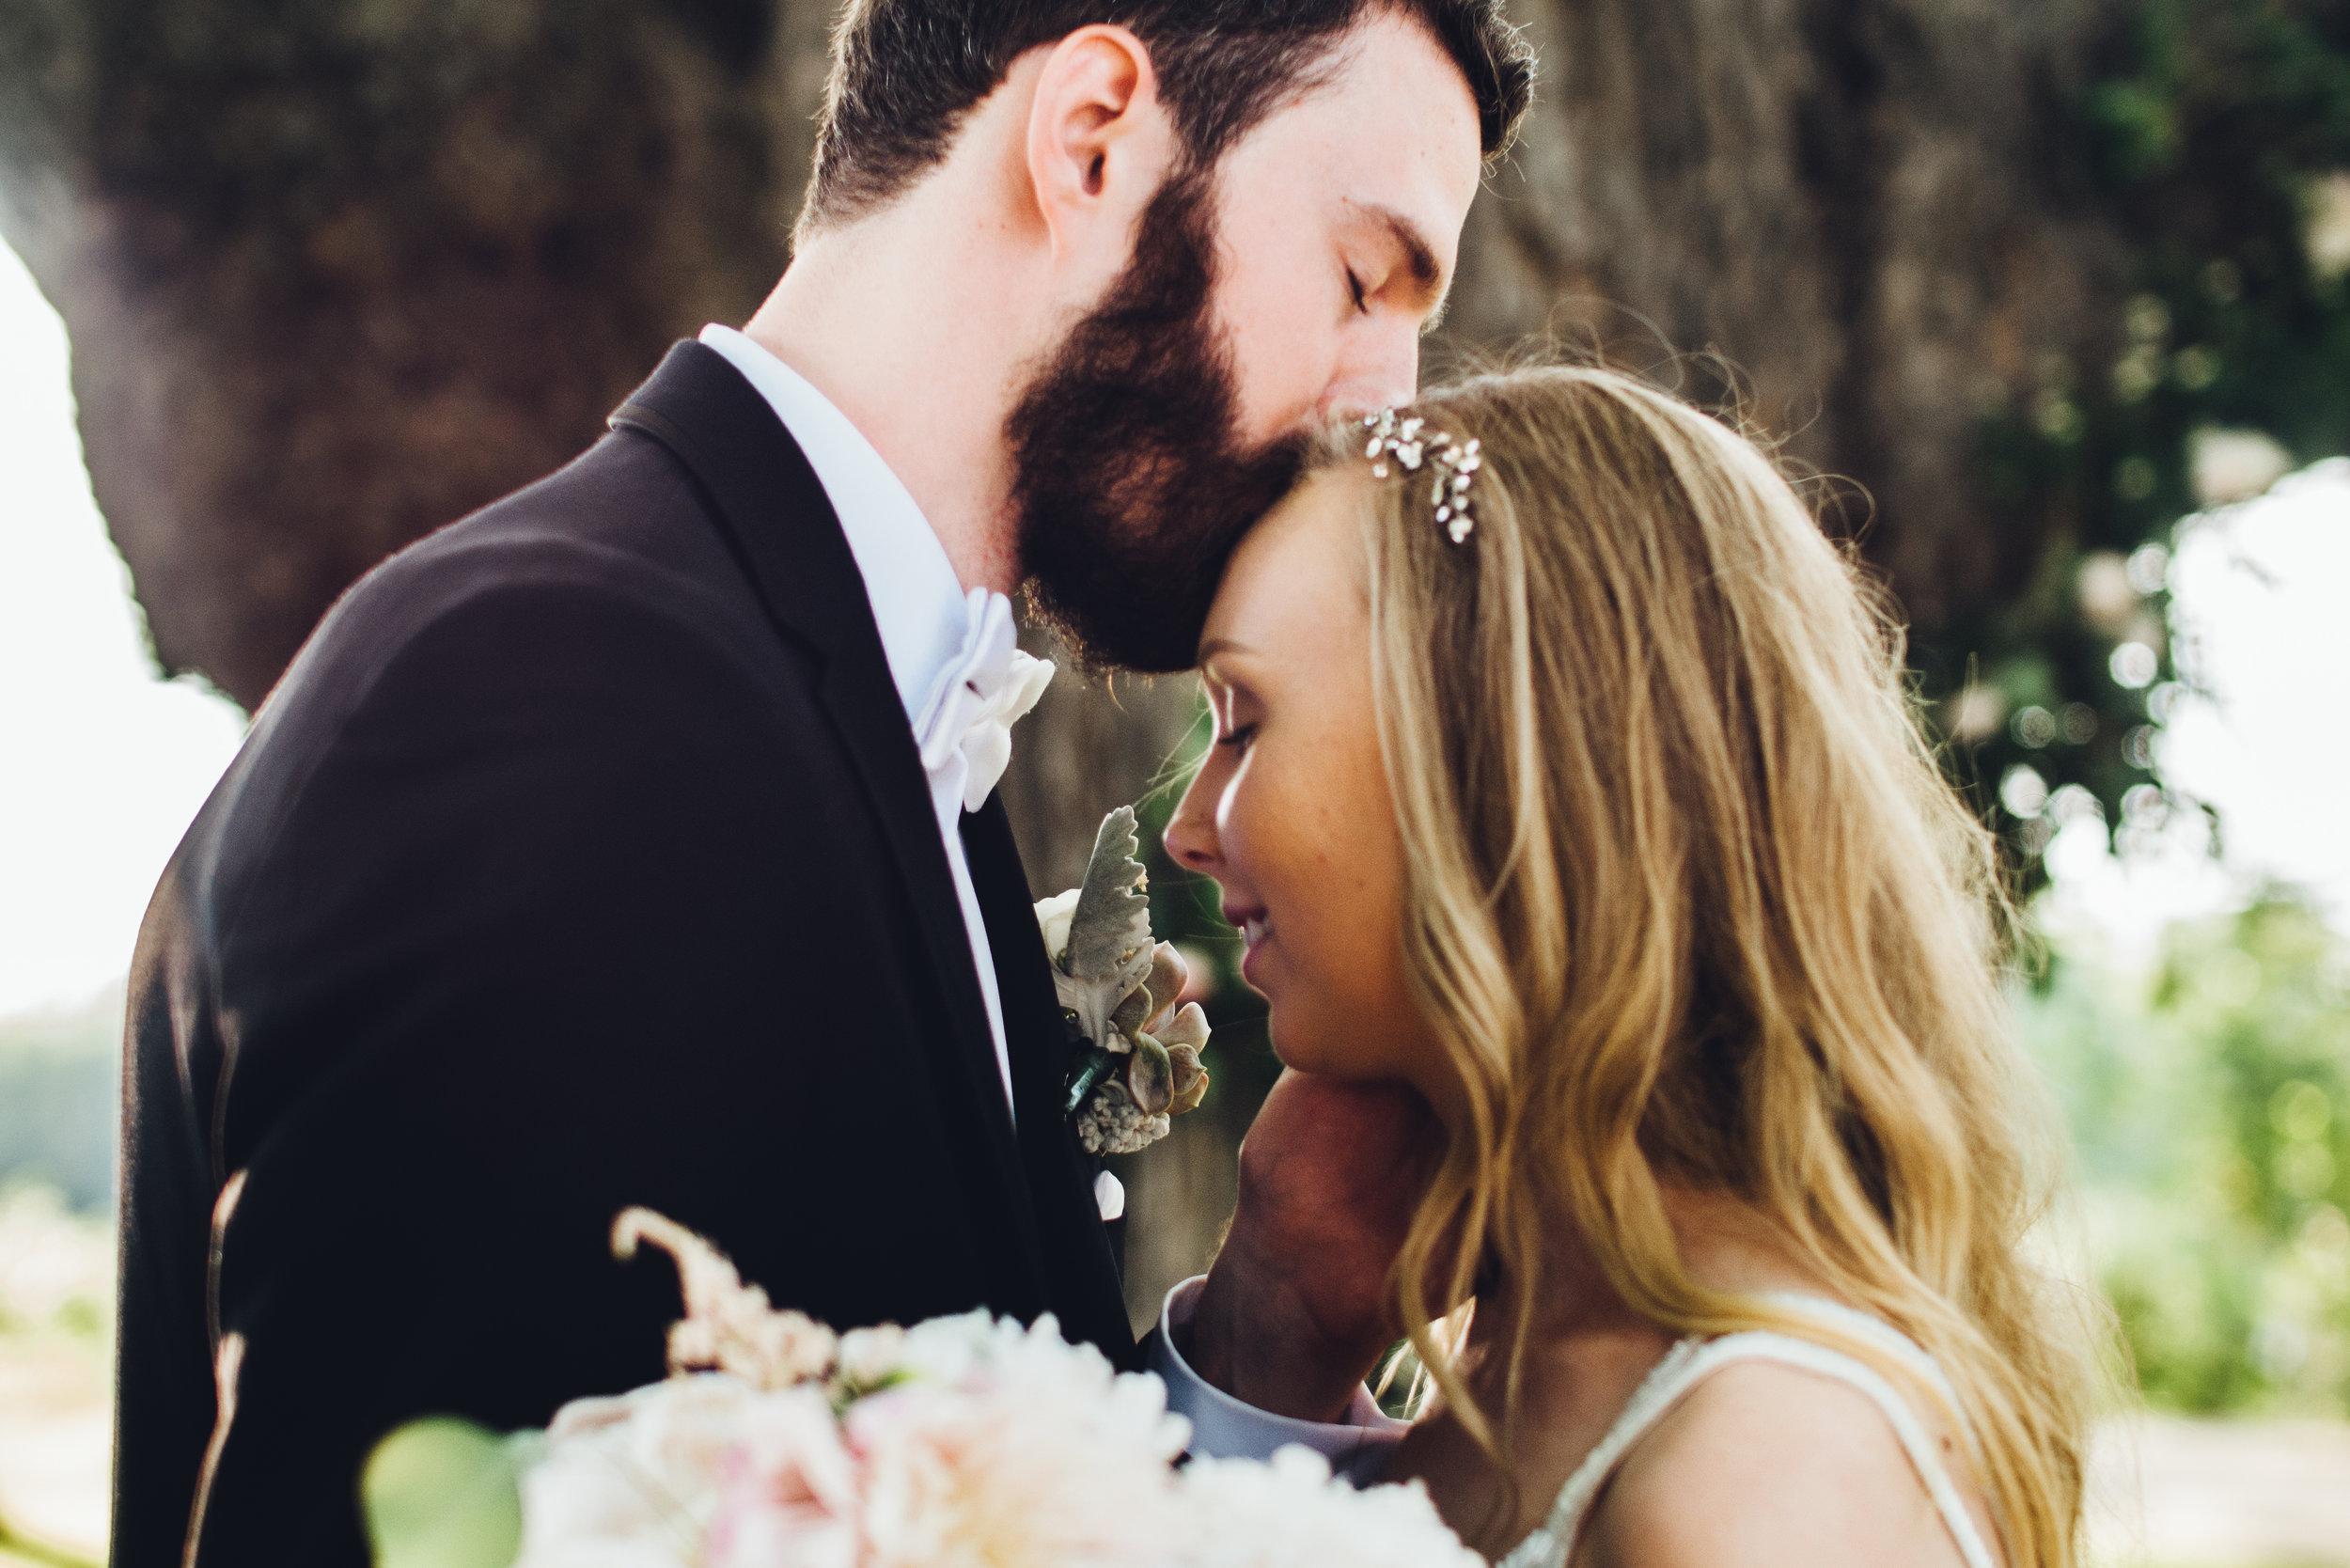 jessica-david-ledwidge-video-film-cinema-photographer-photos-photographers-photography-videographer-videographers-videographery-award-winning-wedding